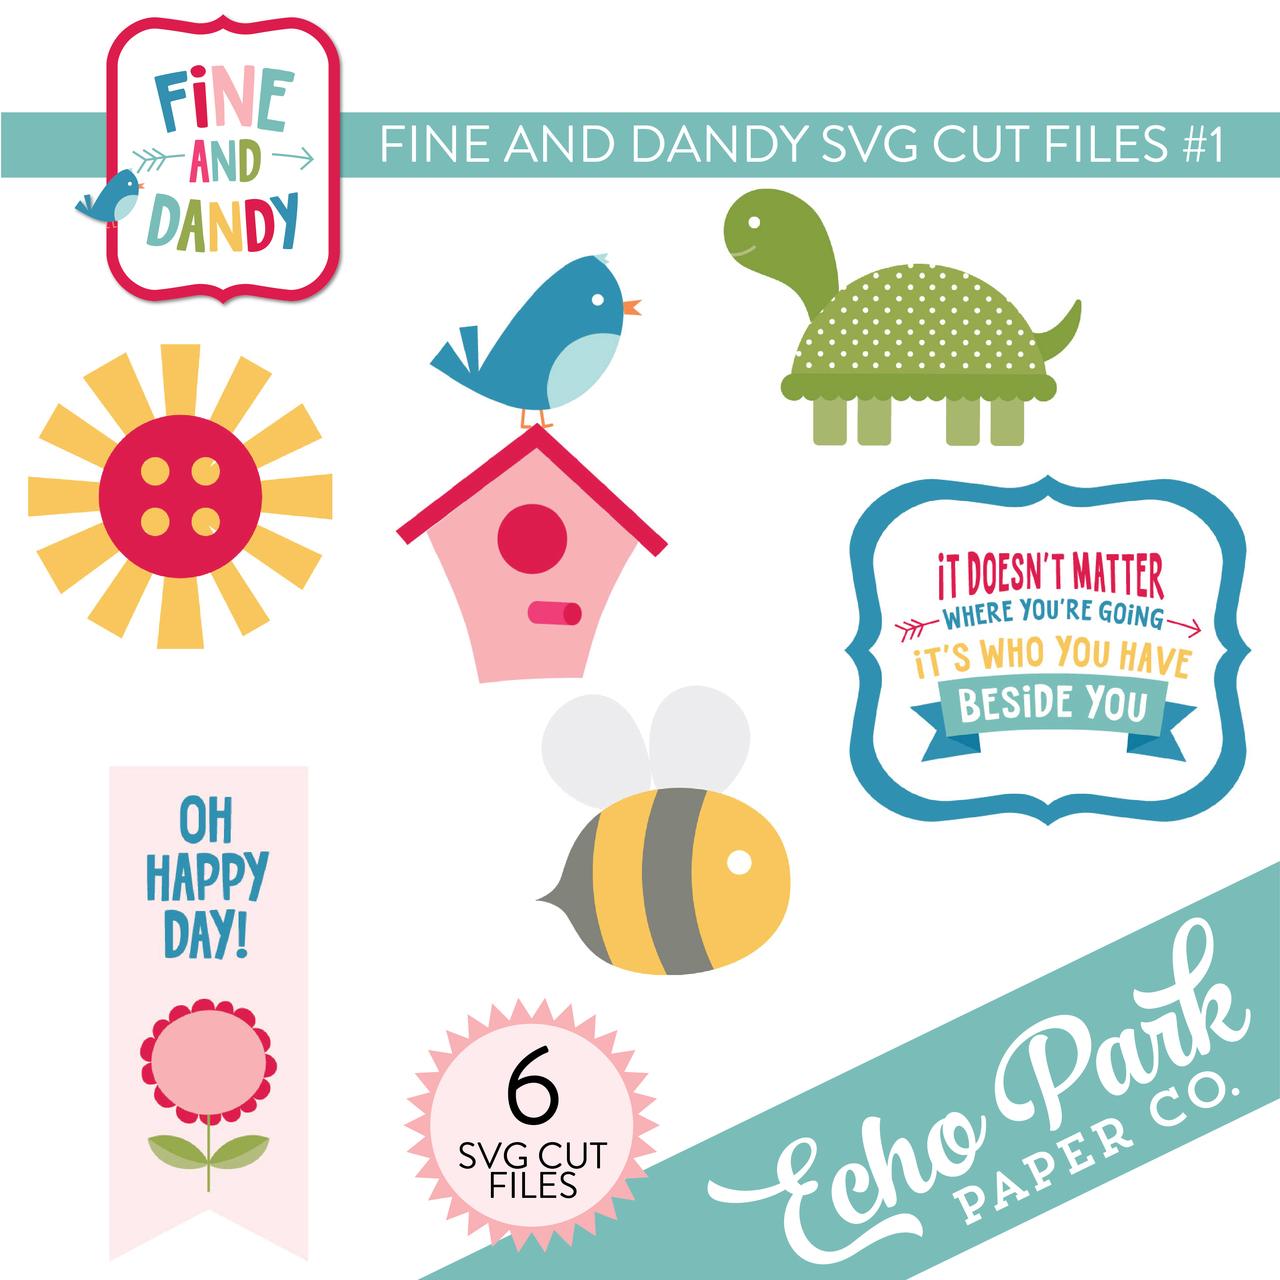 Fine and Dandy SVG Cut Files #1